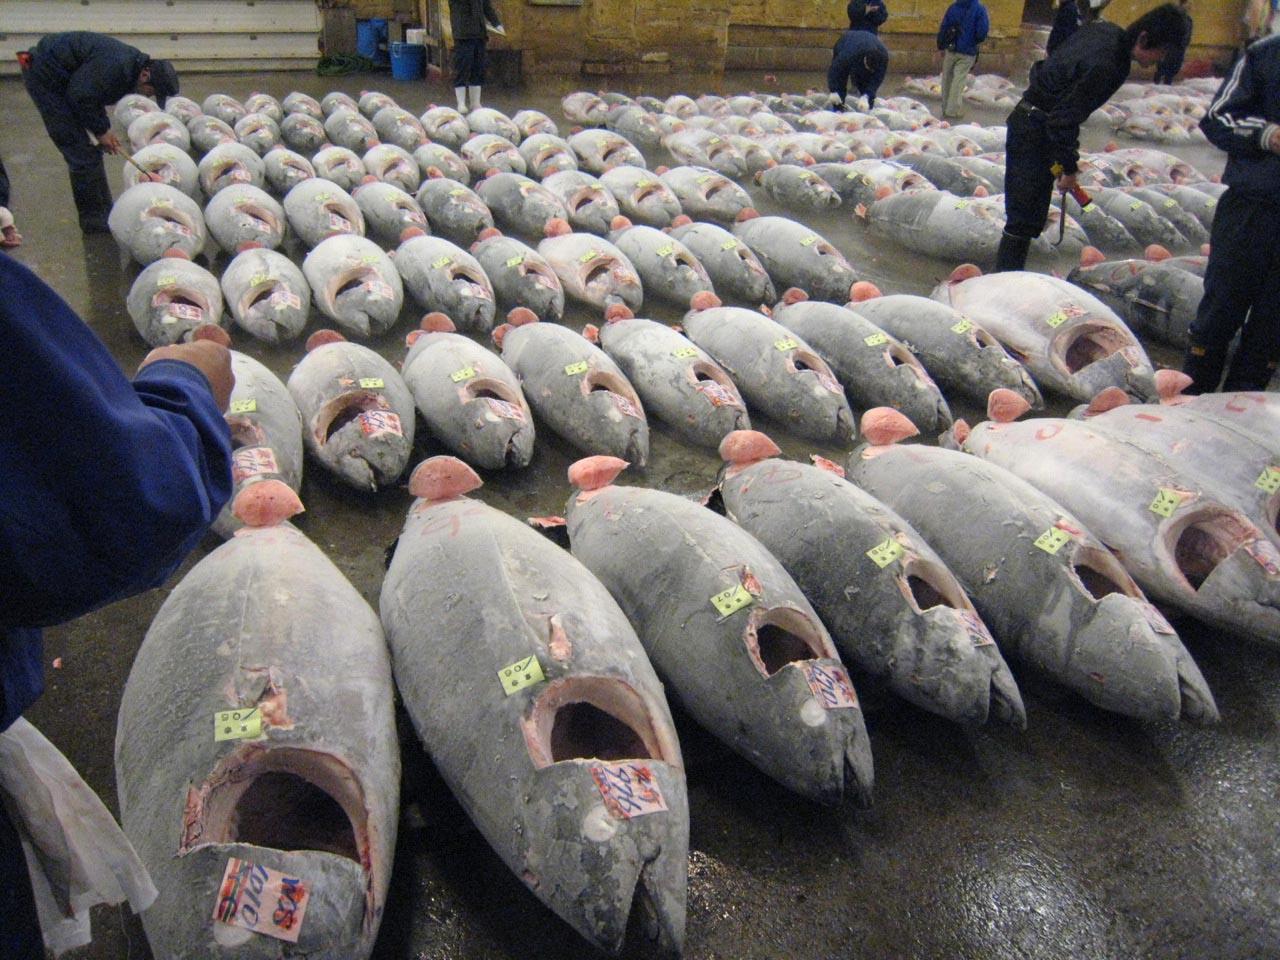 tsukiji market1 Biggest Wholesale Fish and Seafood Market